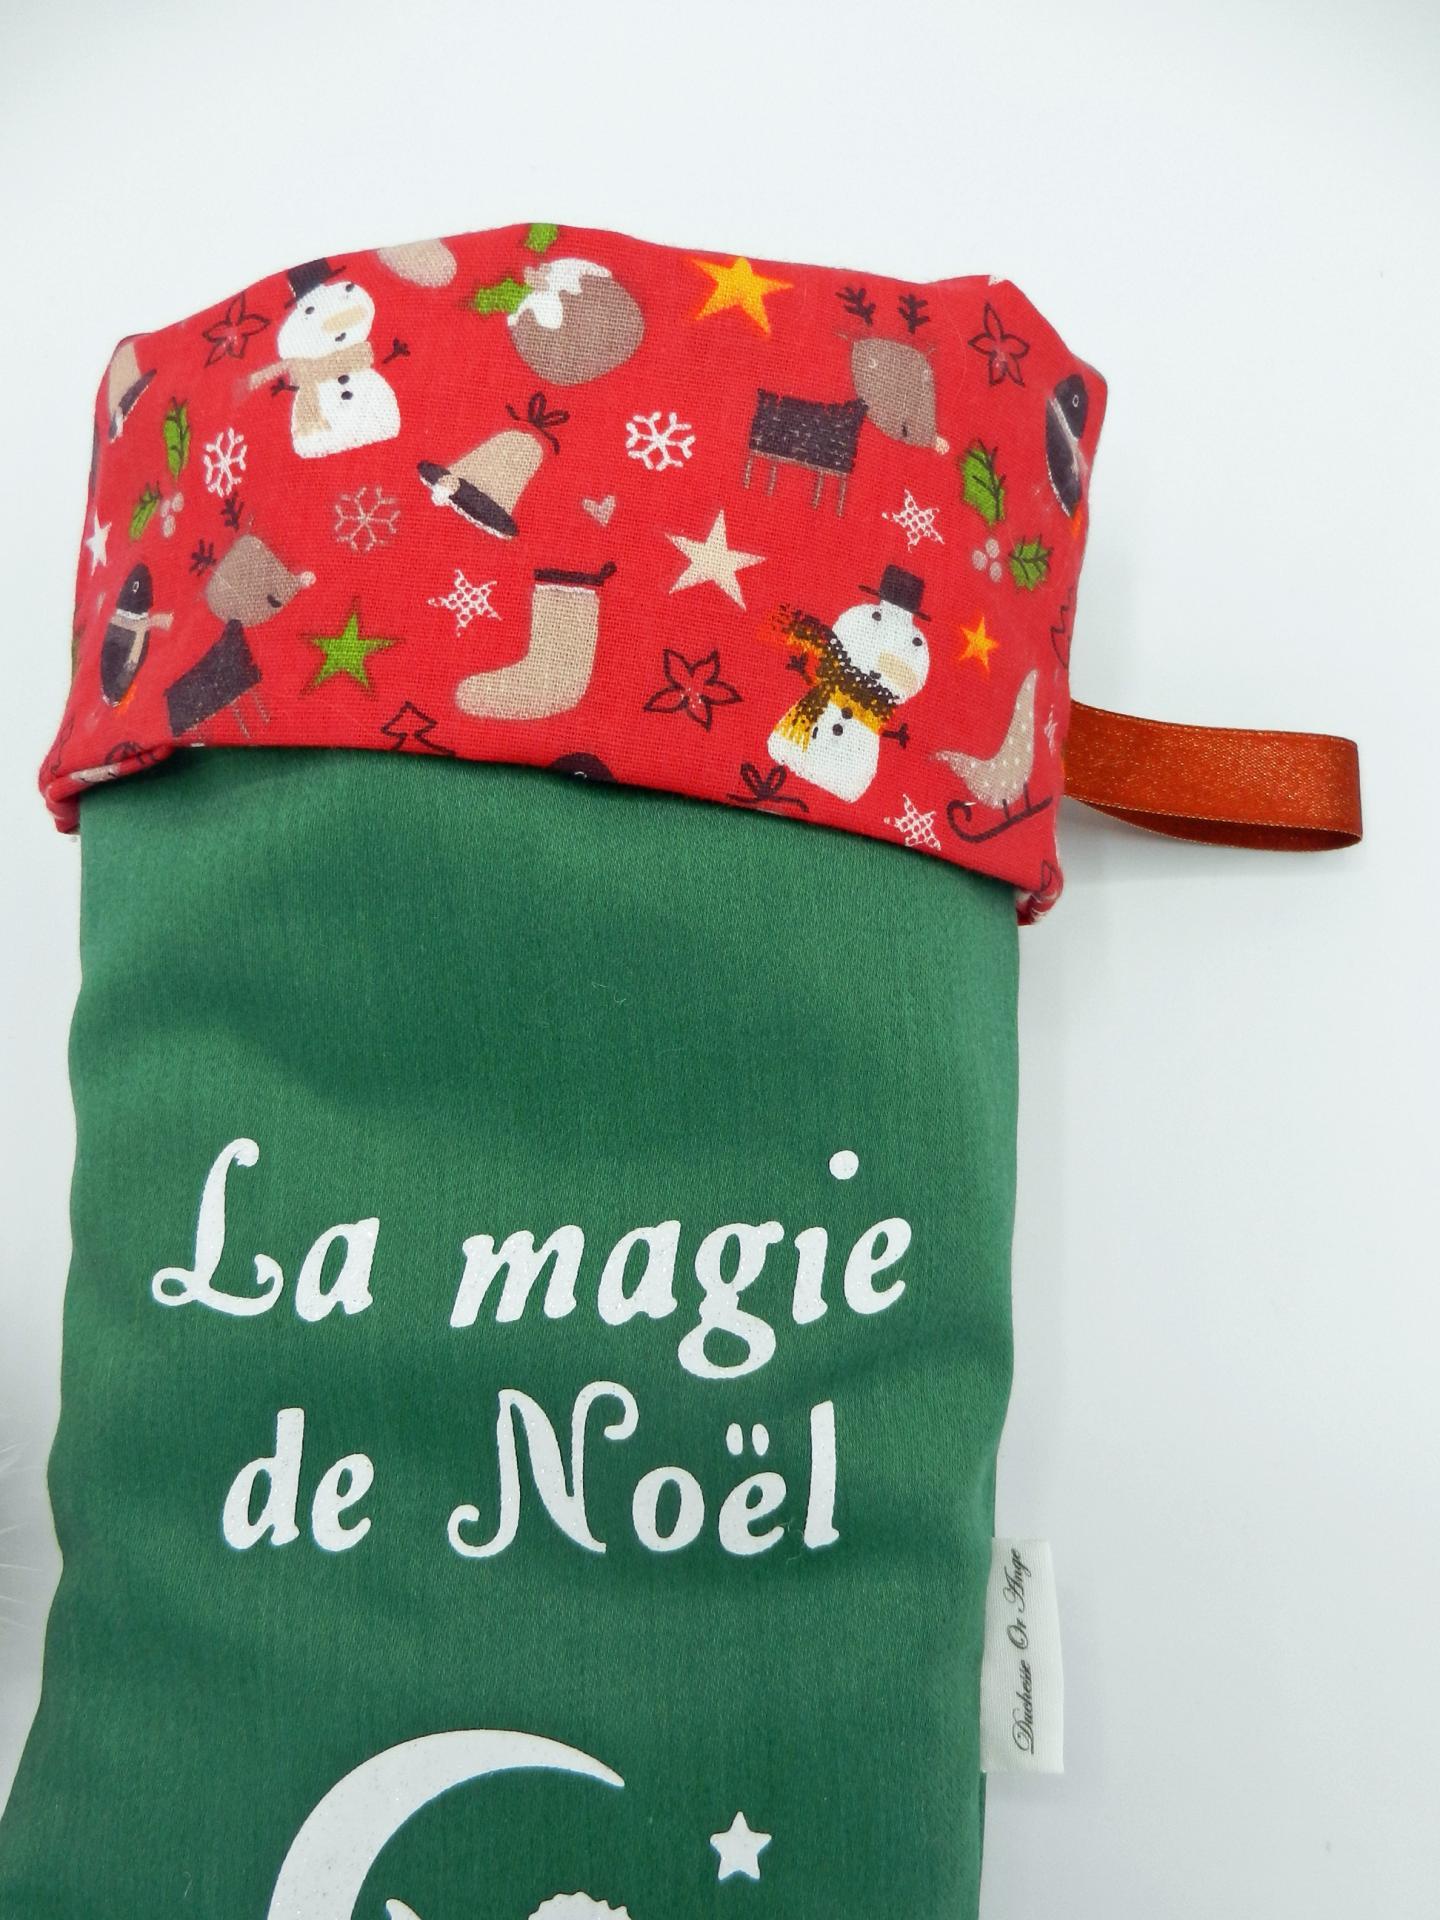 Duchesse or ange doaa 82 botte de noel verte bonhomme de neige rouge prenom c